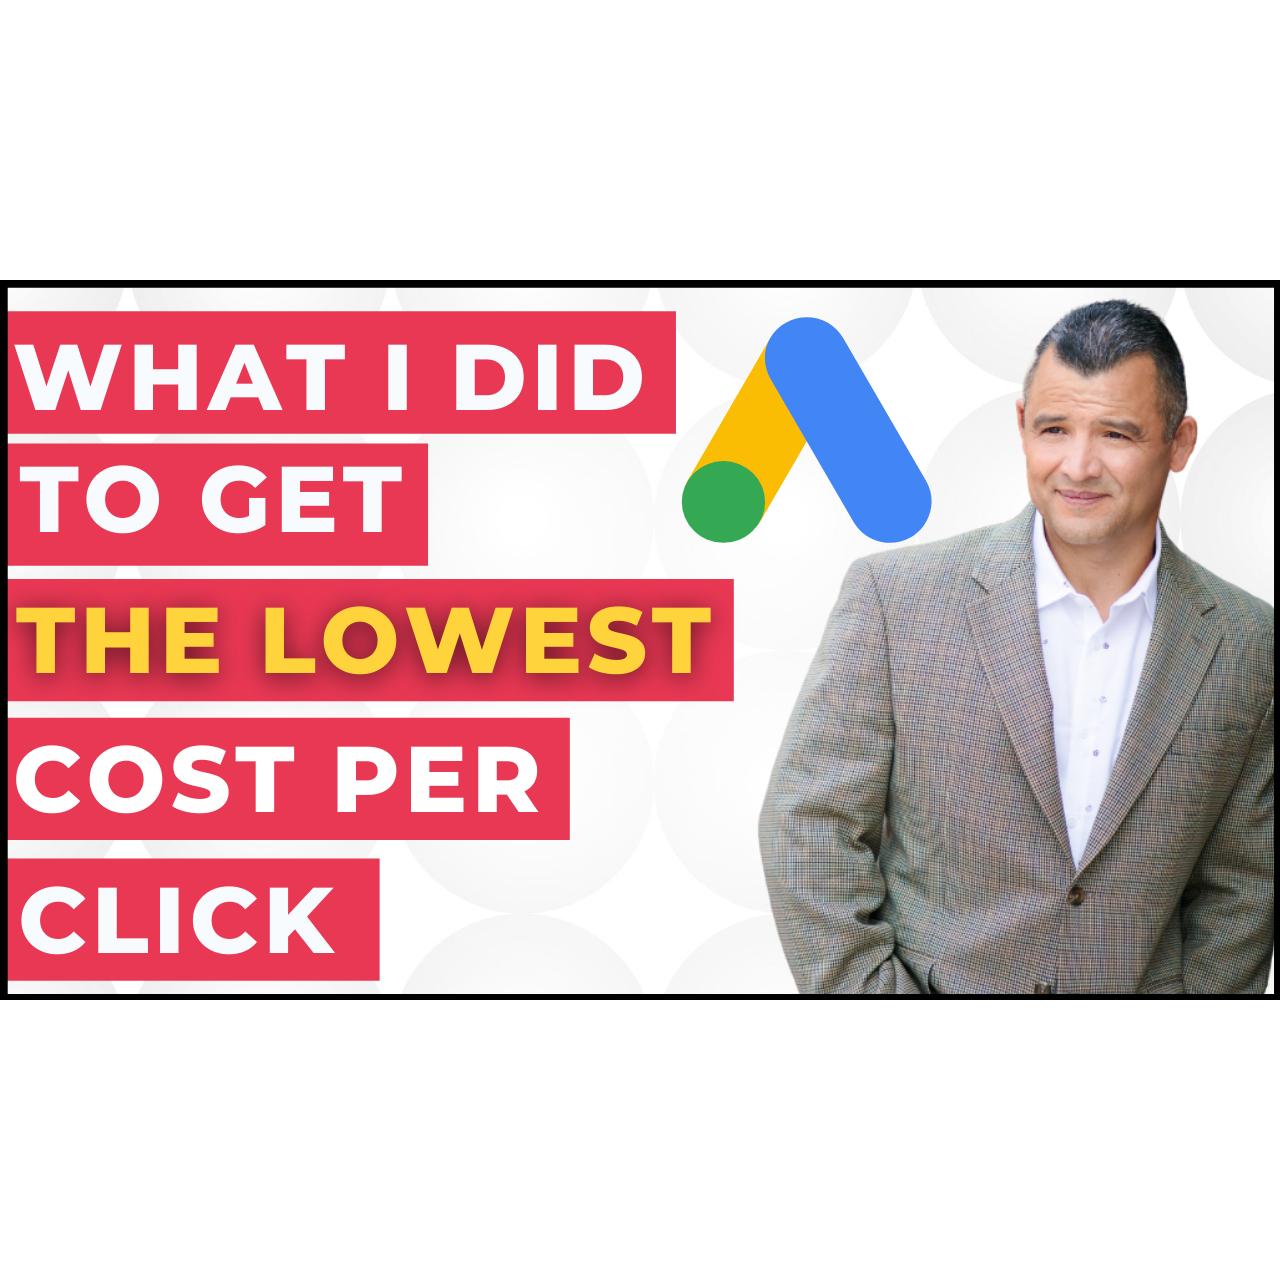 Lower CPC Google Ads